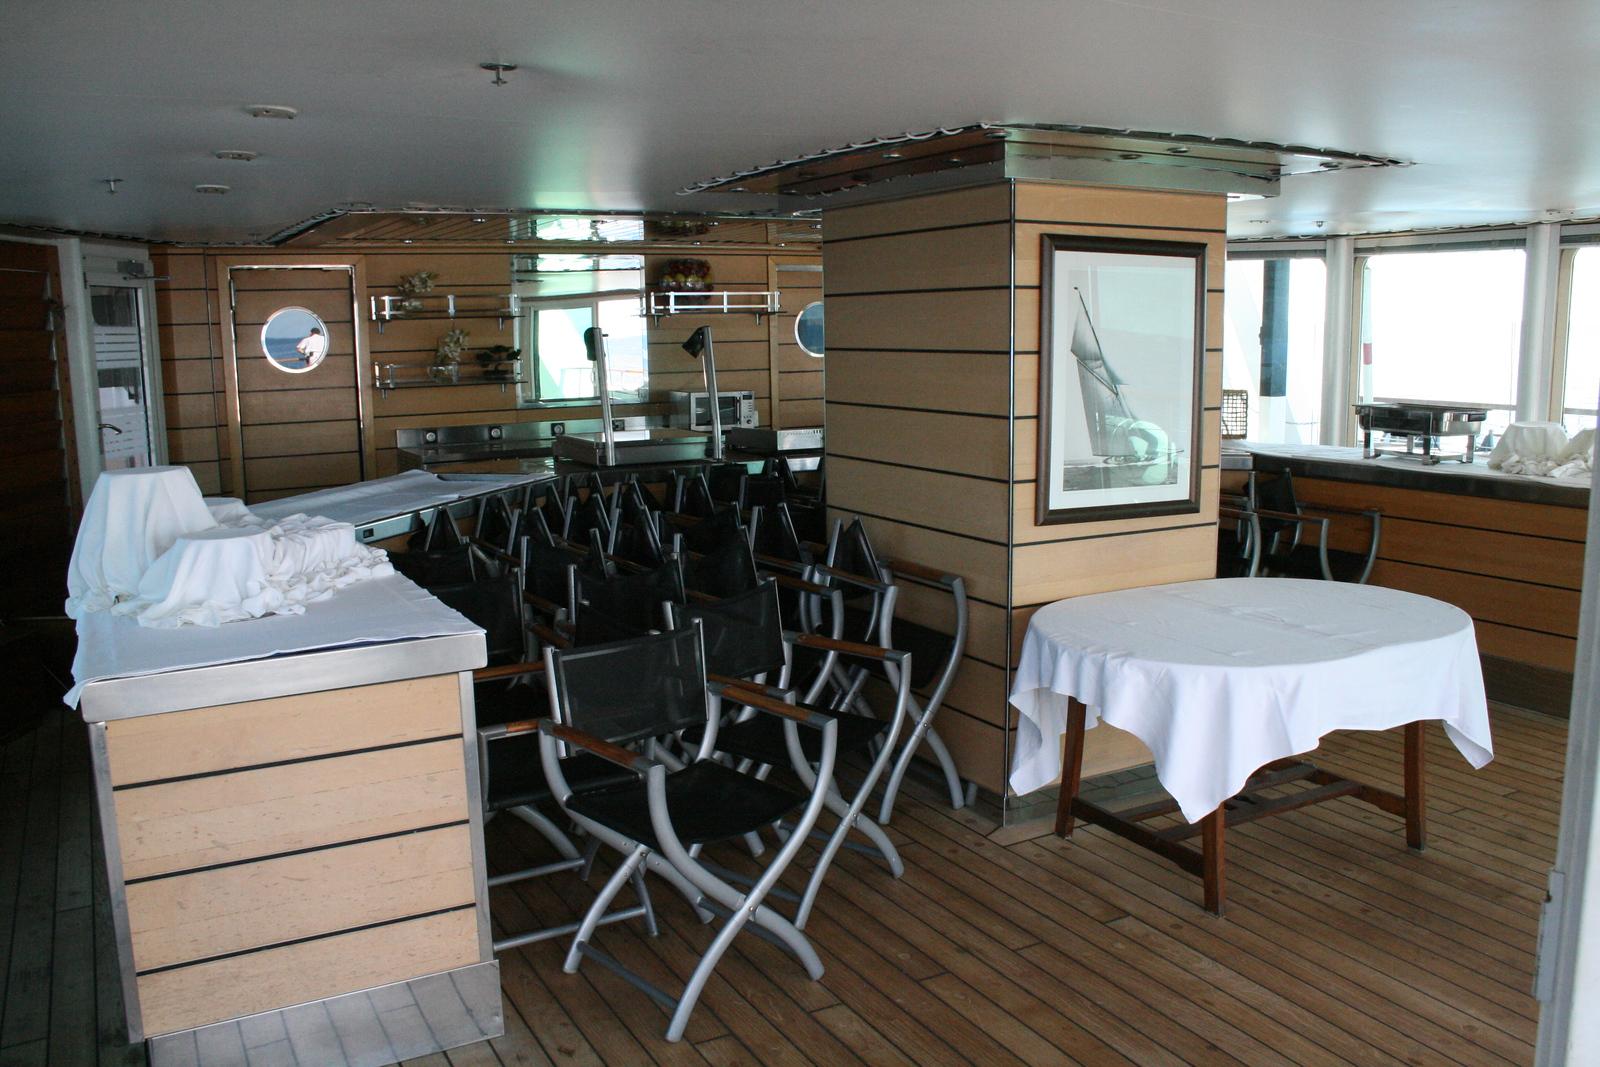 2011 - On board M/S LE PONANT : buffet of Le Diamant restaurant, Antigua deck.